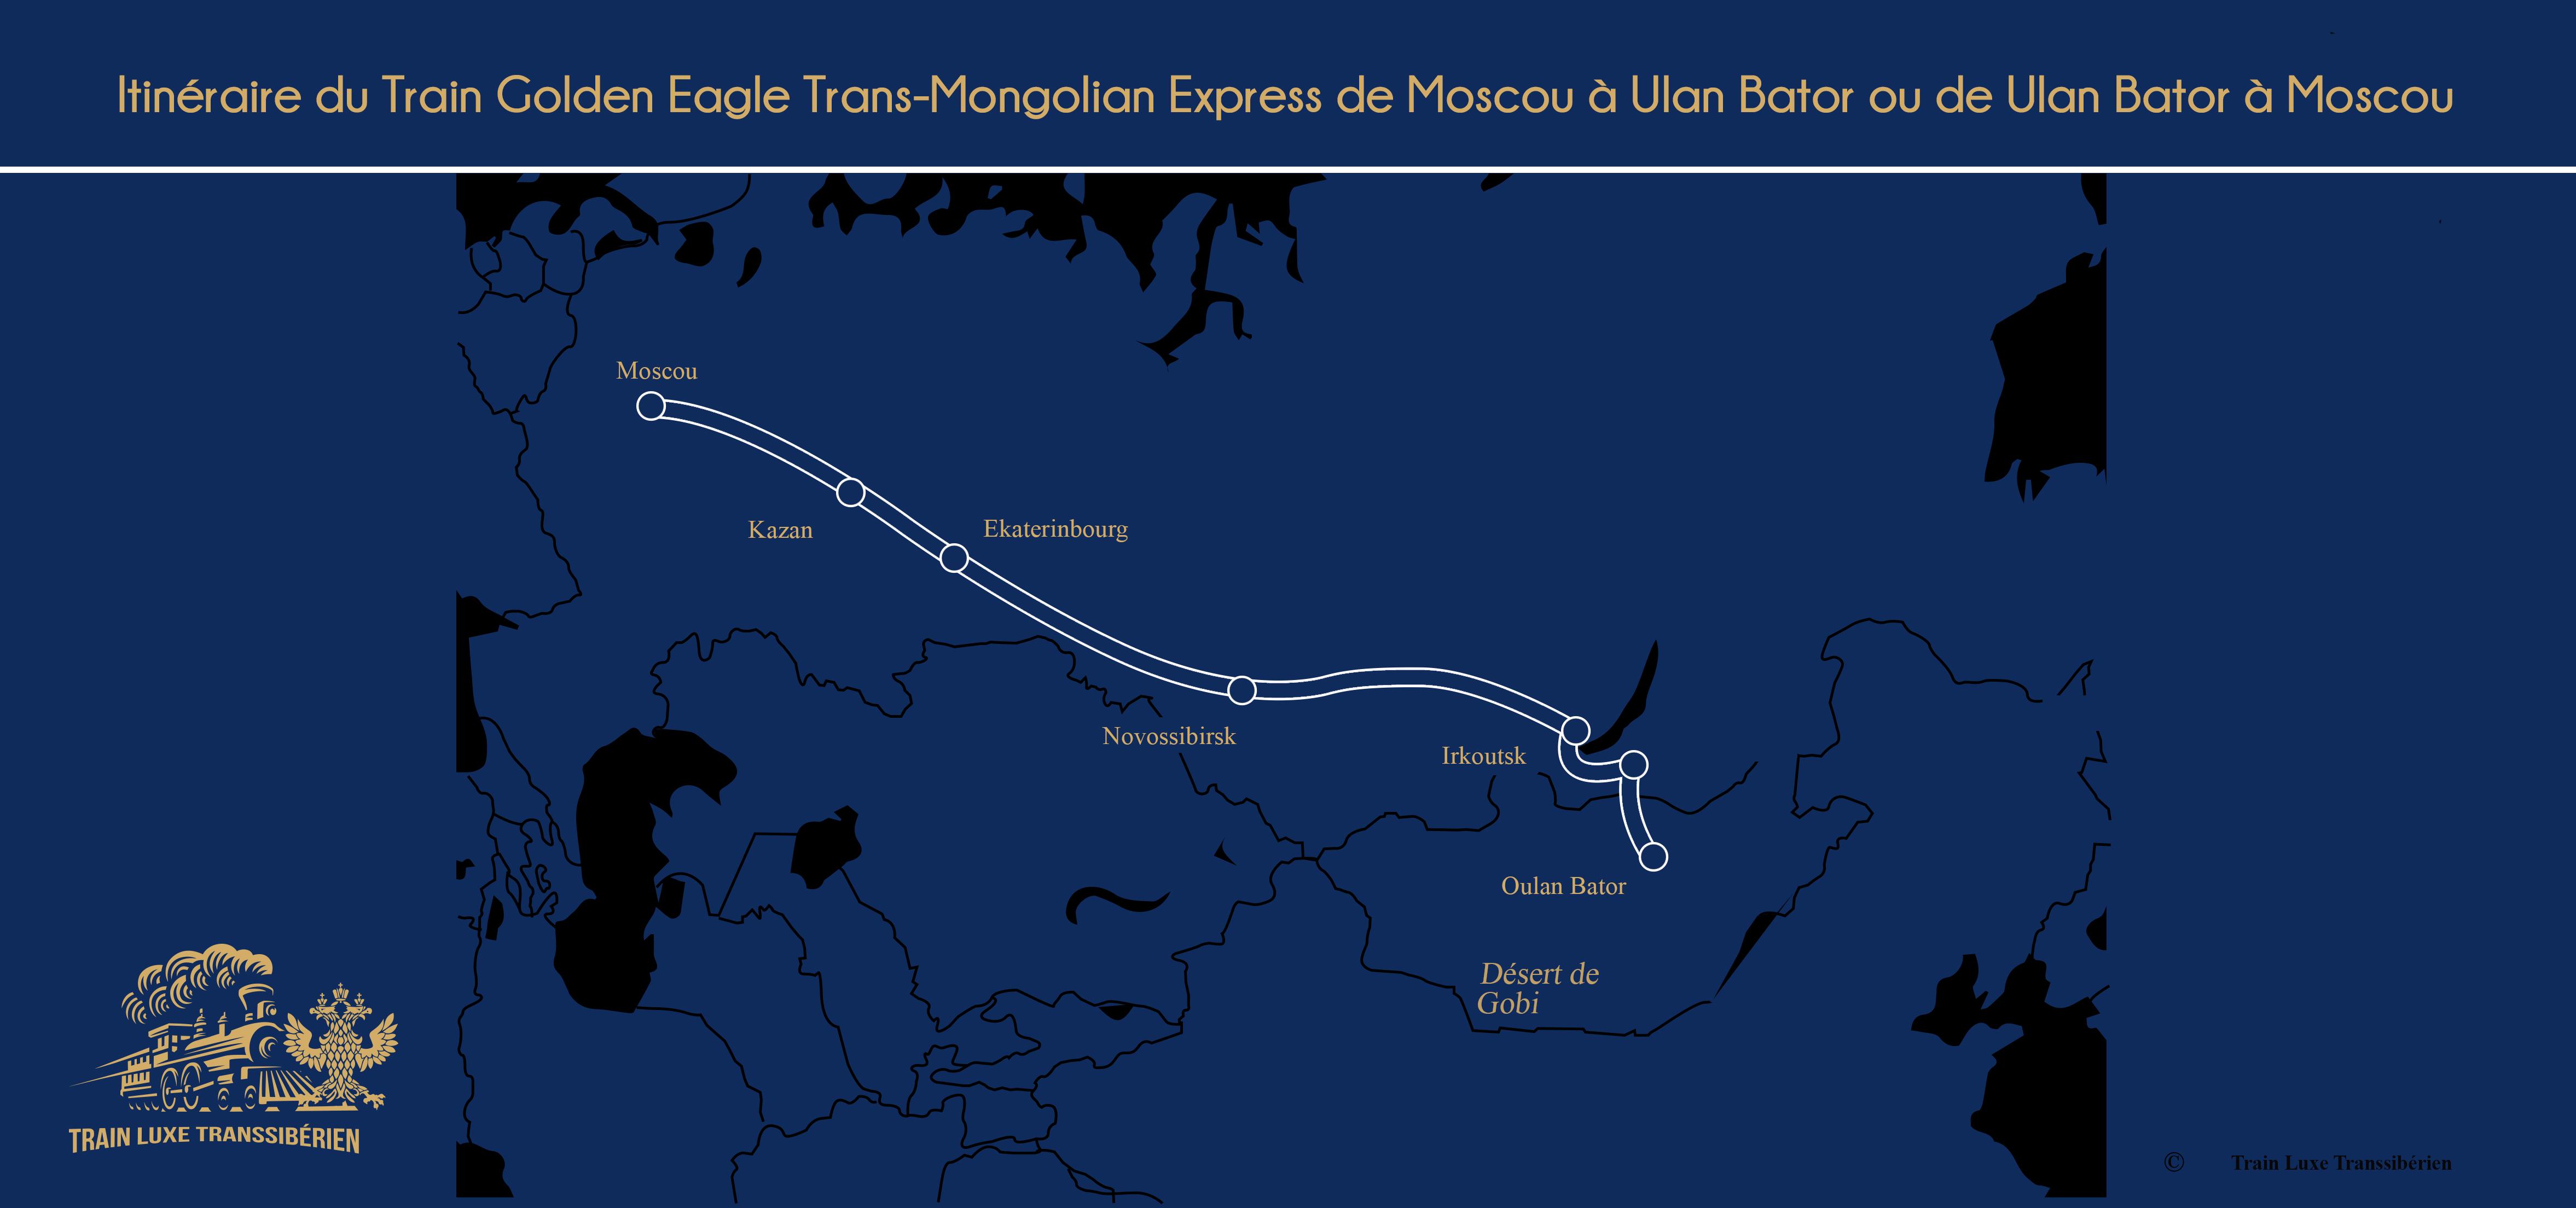 Itinéraire du Train Golden Eagle Trans Mongolian Express de Moscou-à Ulan Bator